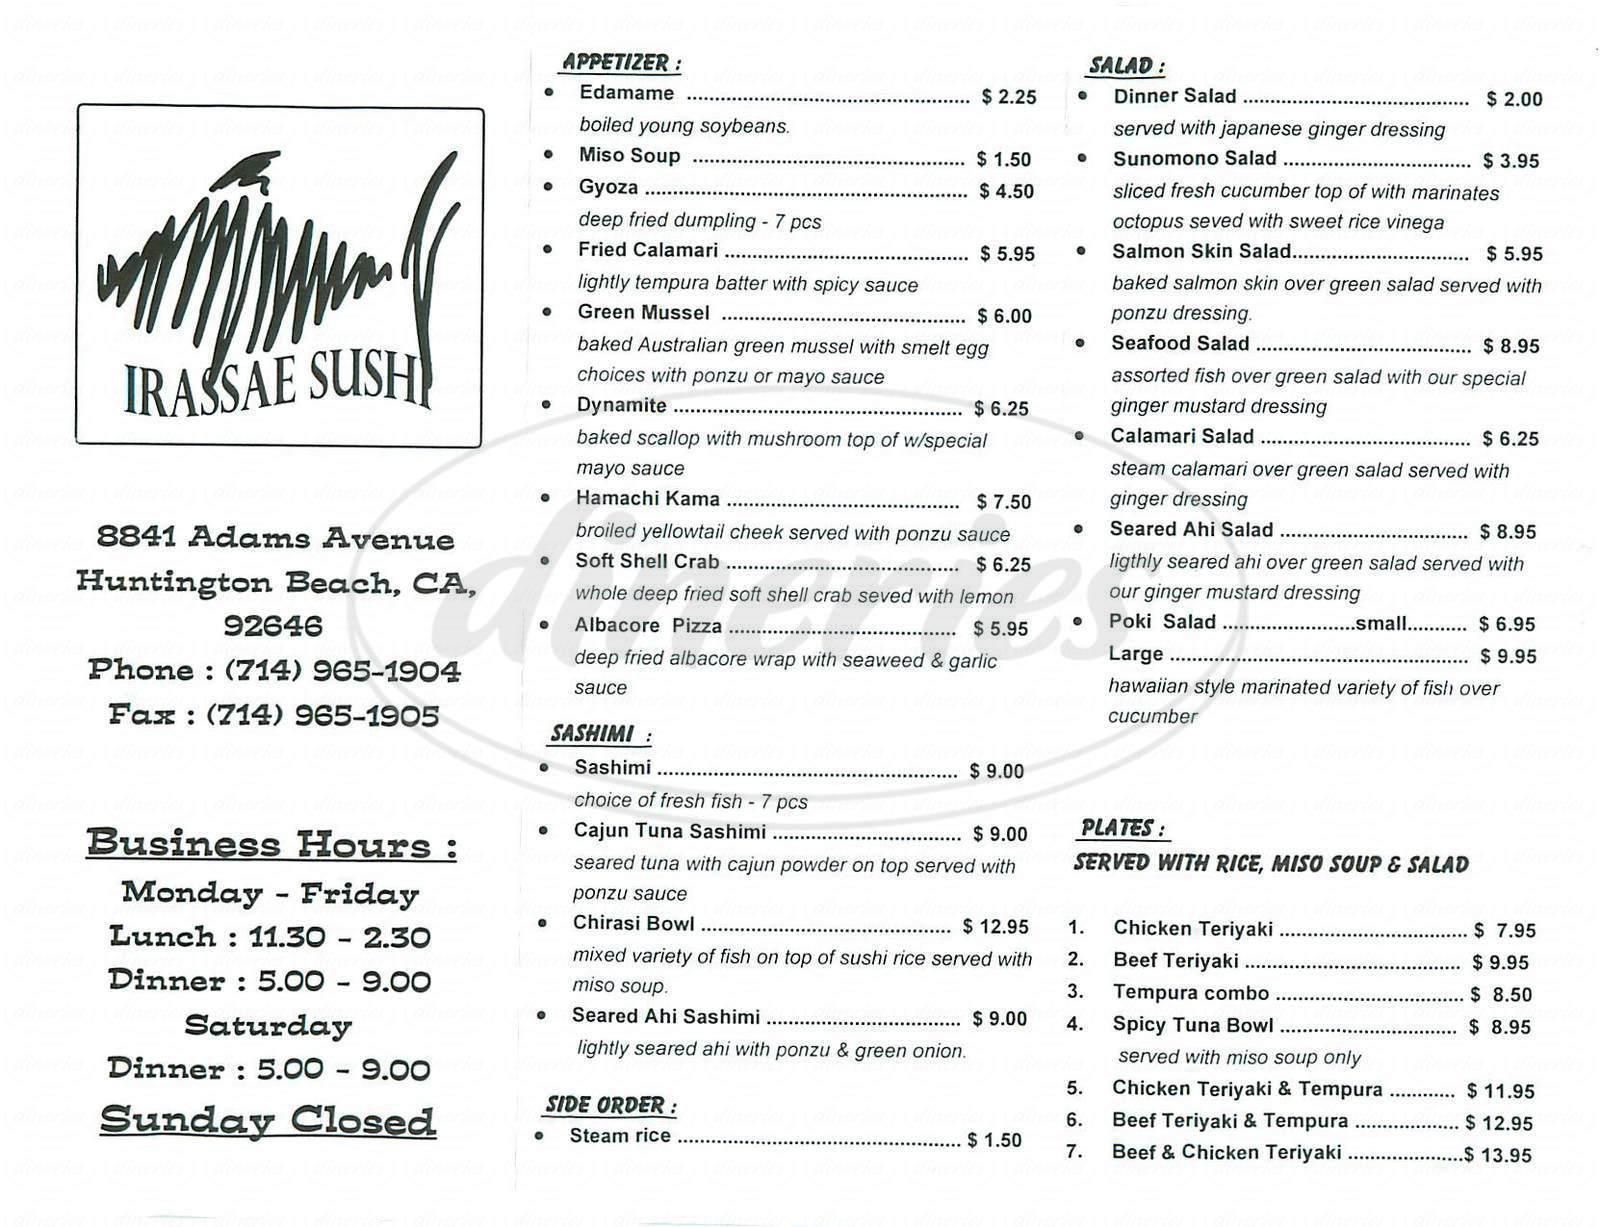 menu for Irassae Sushi